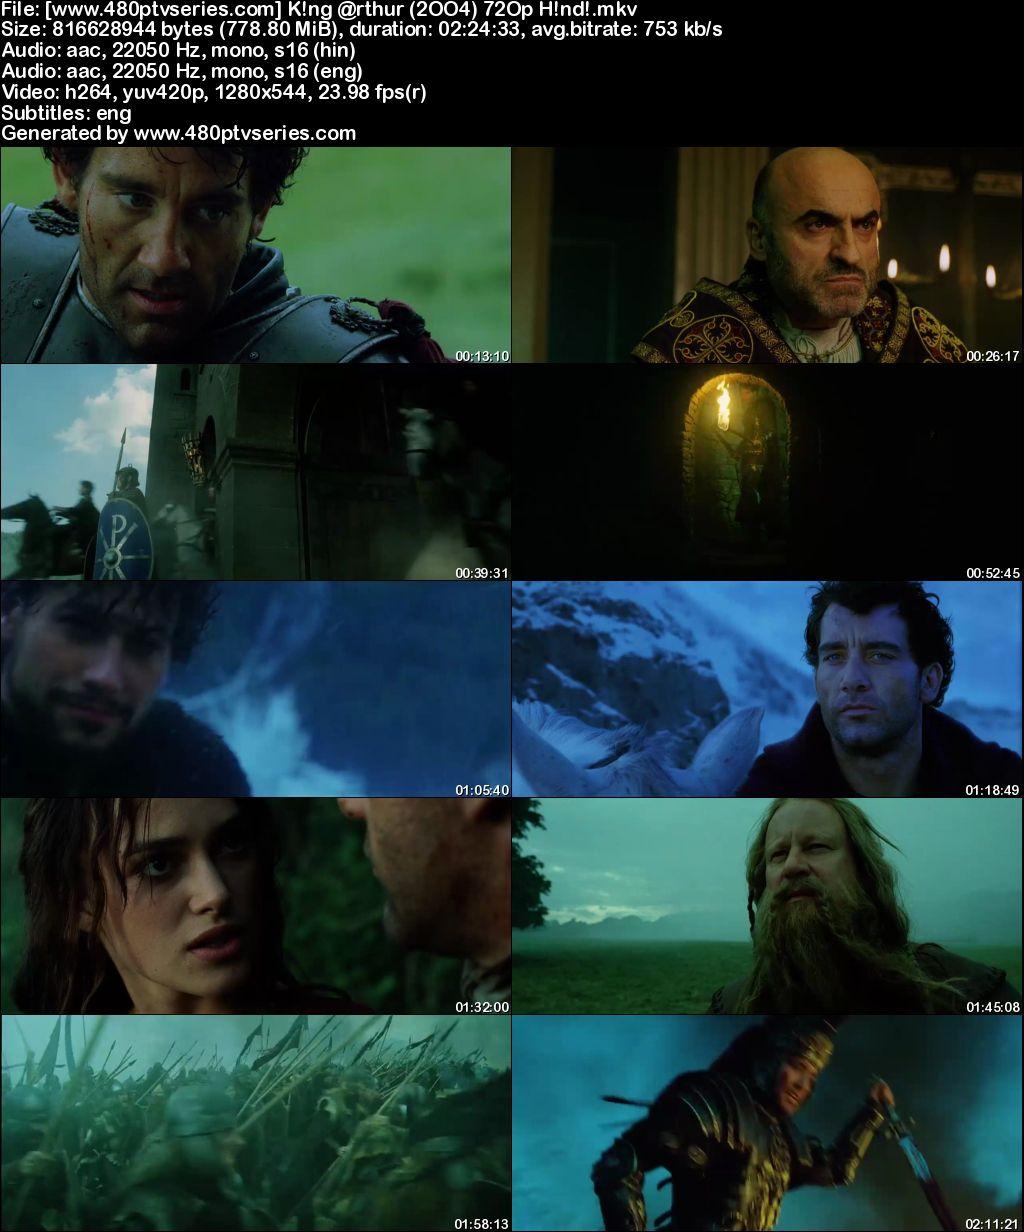 Watch Online Free King Arthur (2004) Full Hindi Dual Audio Movie Download 480p 720p Bluray